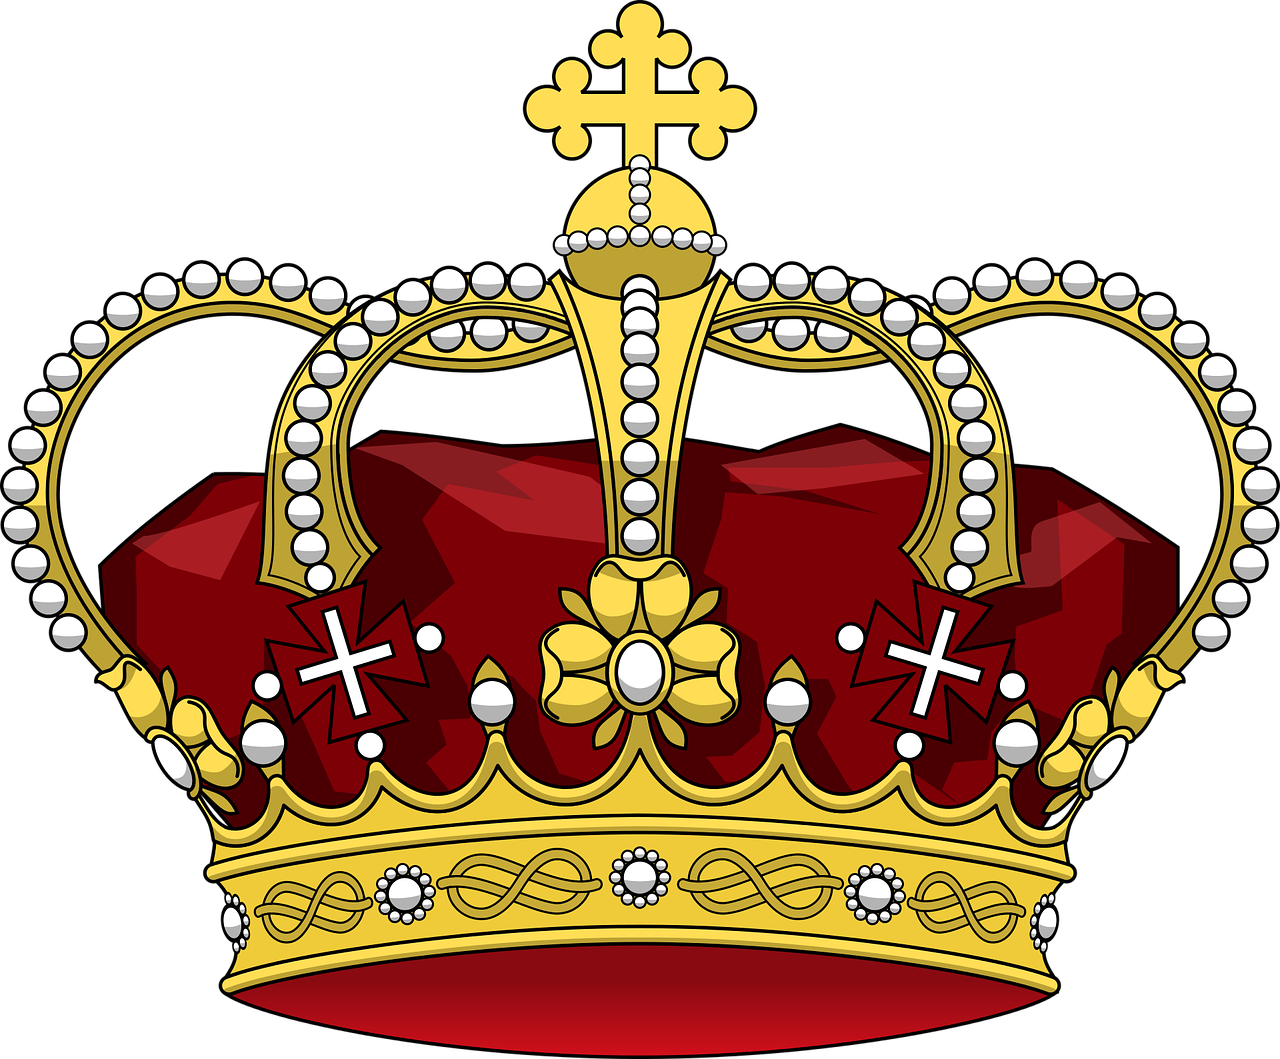 Jewelry crown jewel jewellery. Queen clipart monarchy